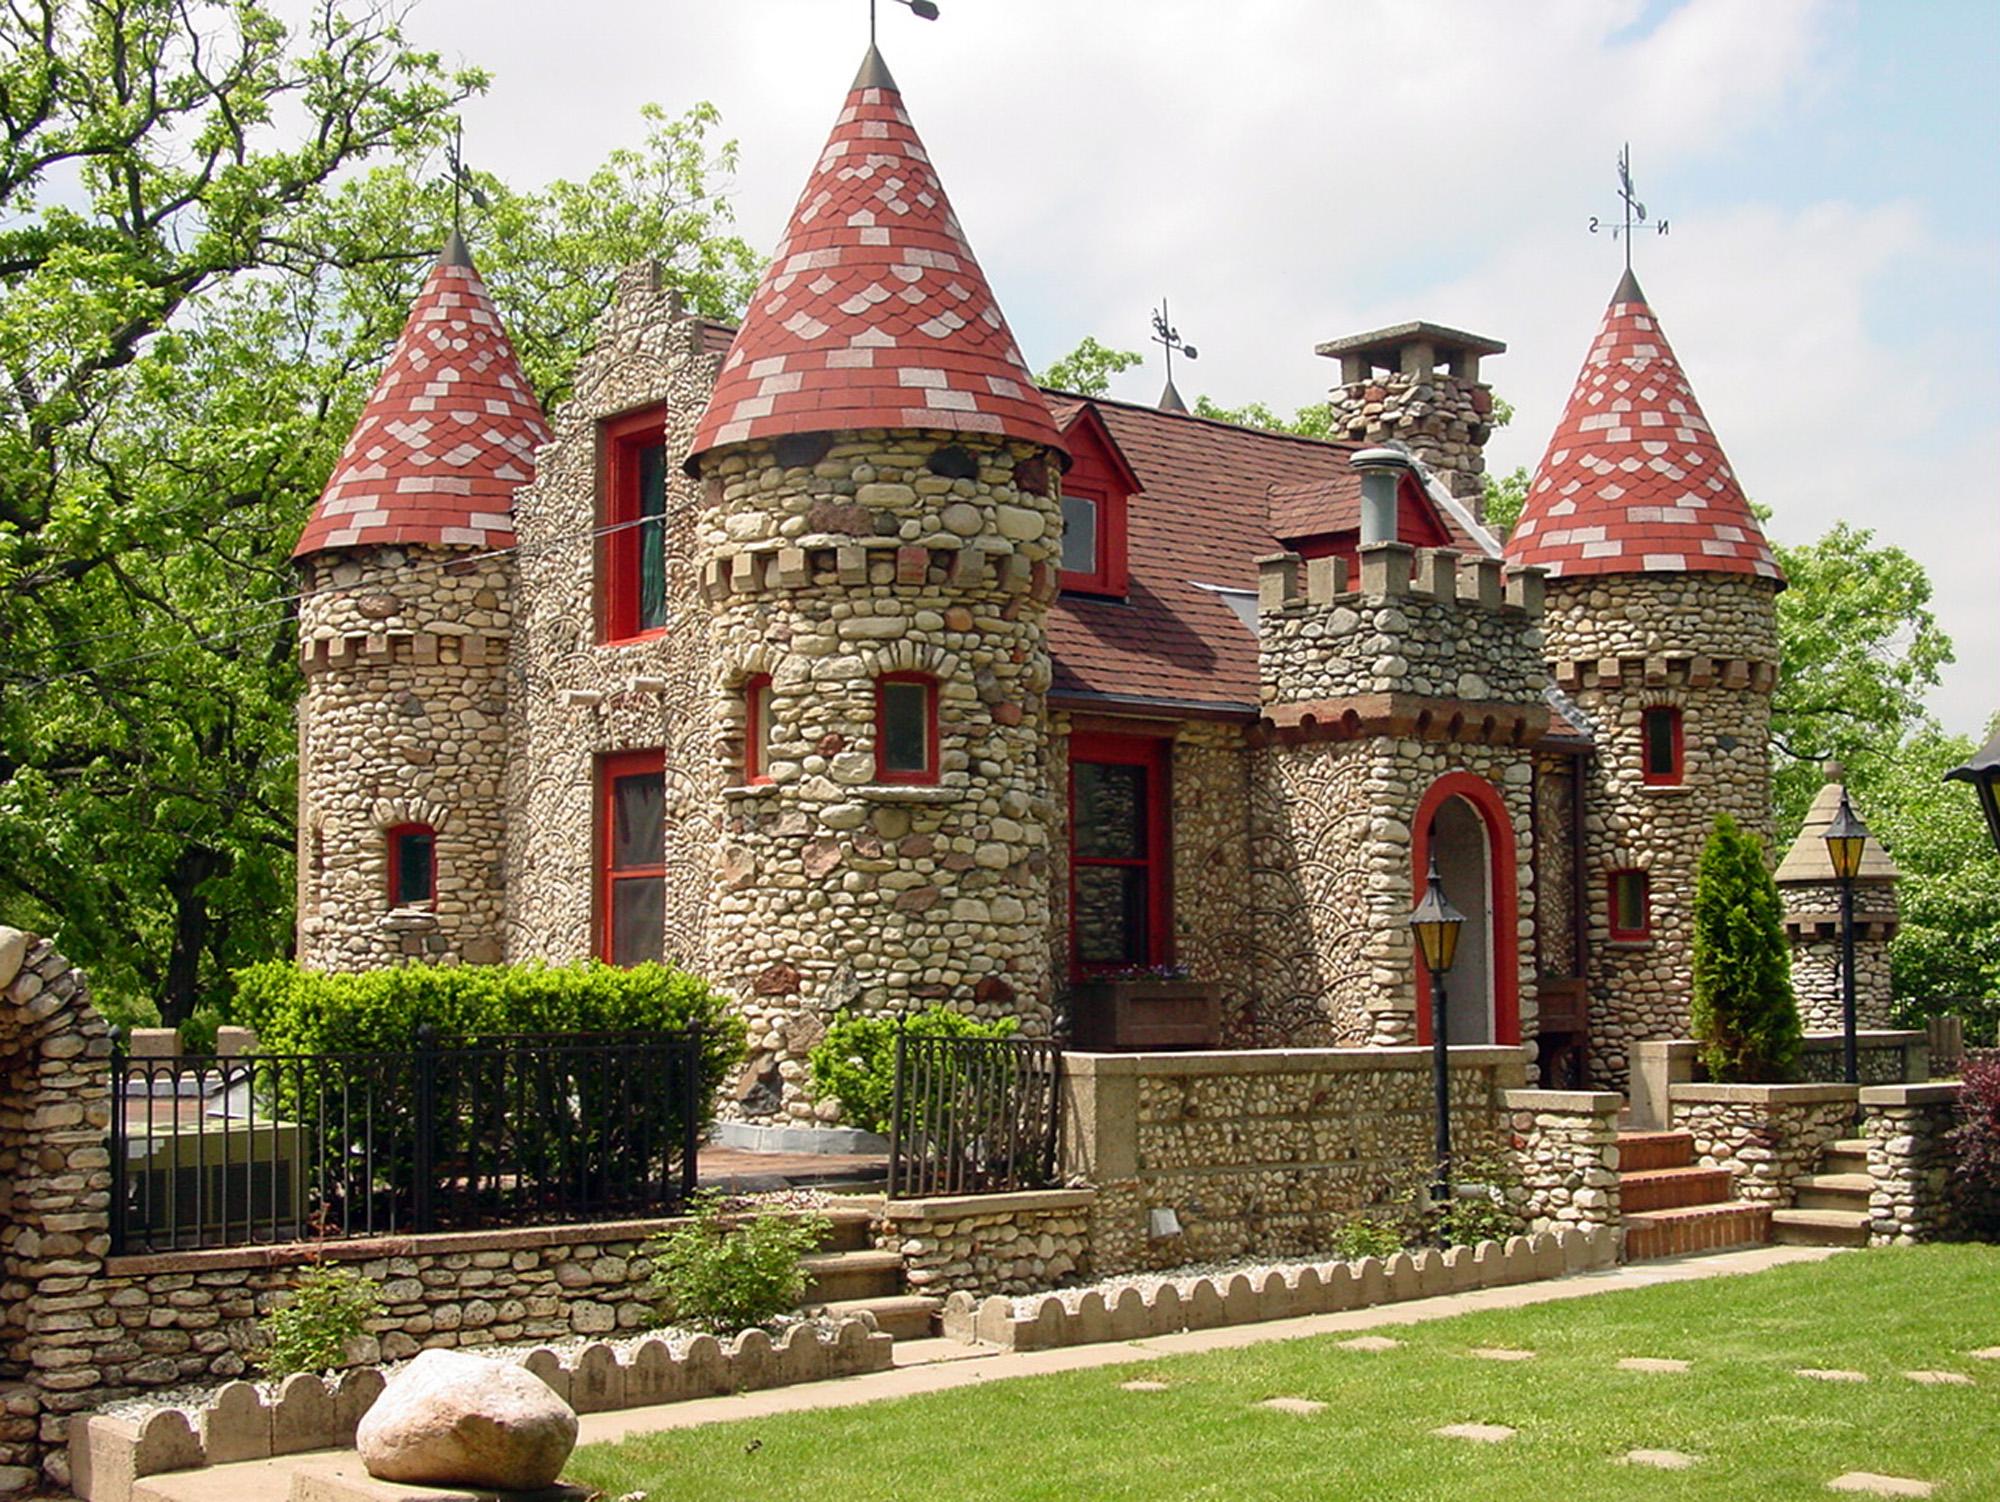 Betendorf castle